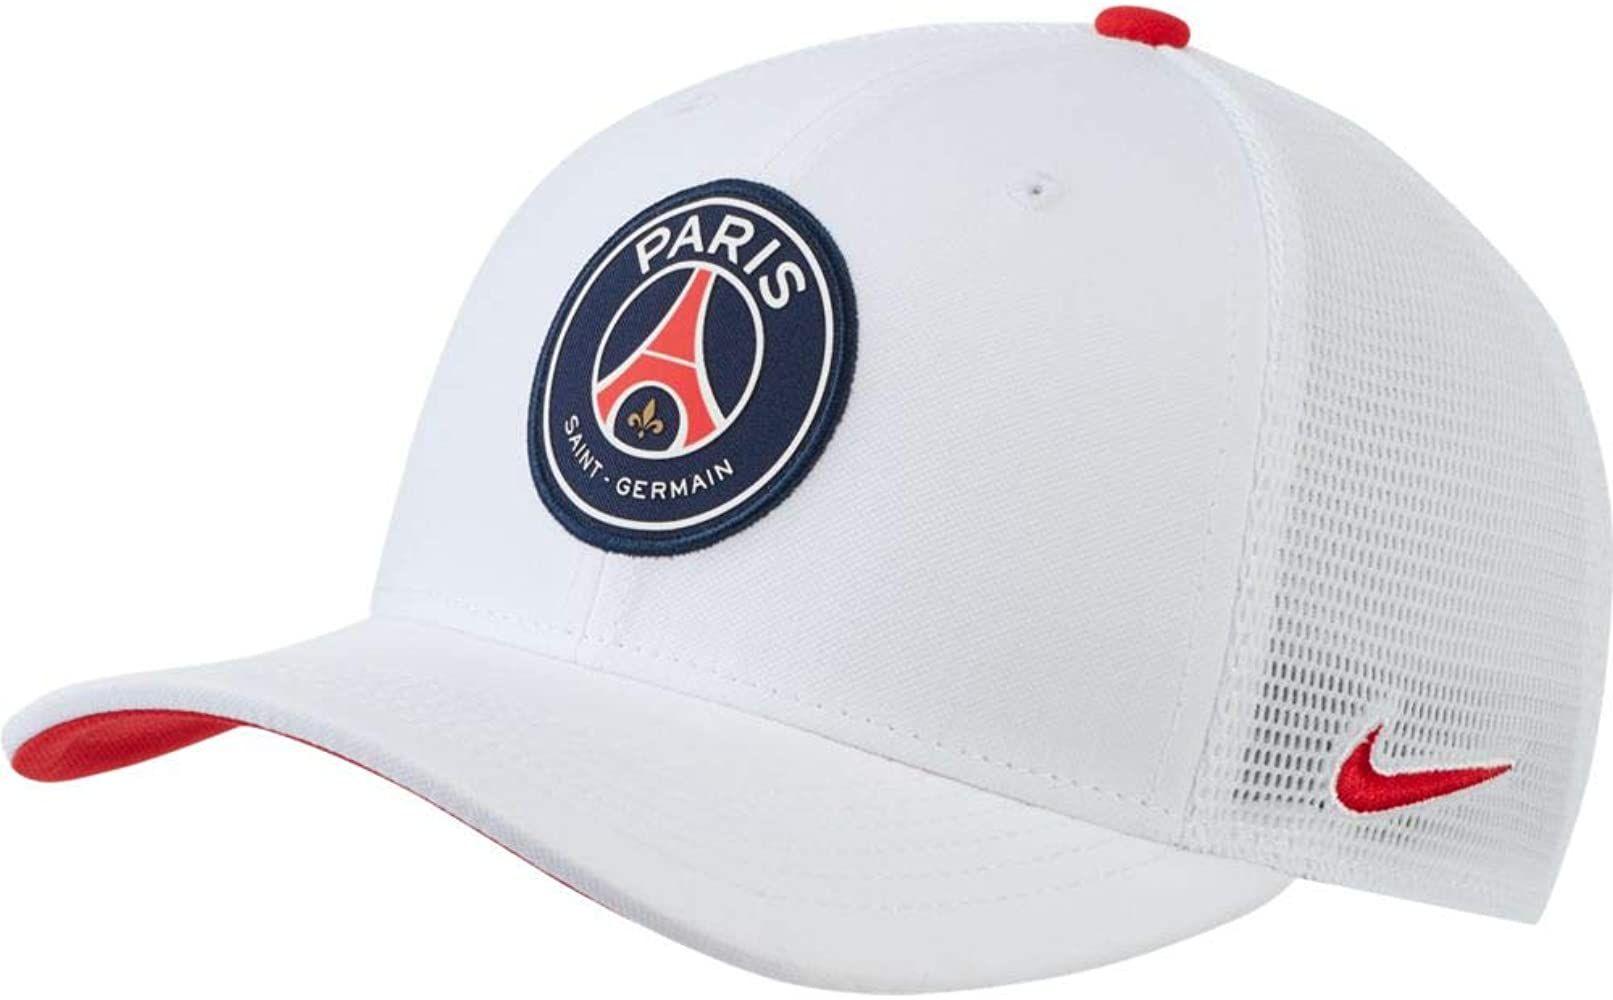 cumpleaños picnic dolor de estómago  Amazon.com: Nike 2020-21 PSG Arobill Classic 99 - Gorra para camioneta,  color blanco: Clothing   Paris saint-germain, Nike classic, Paris saint